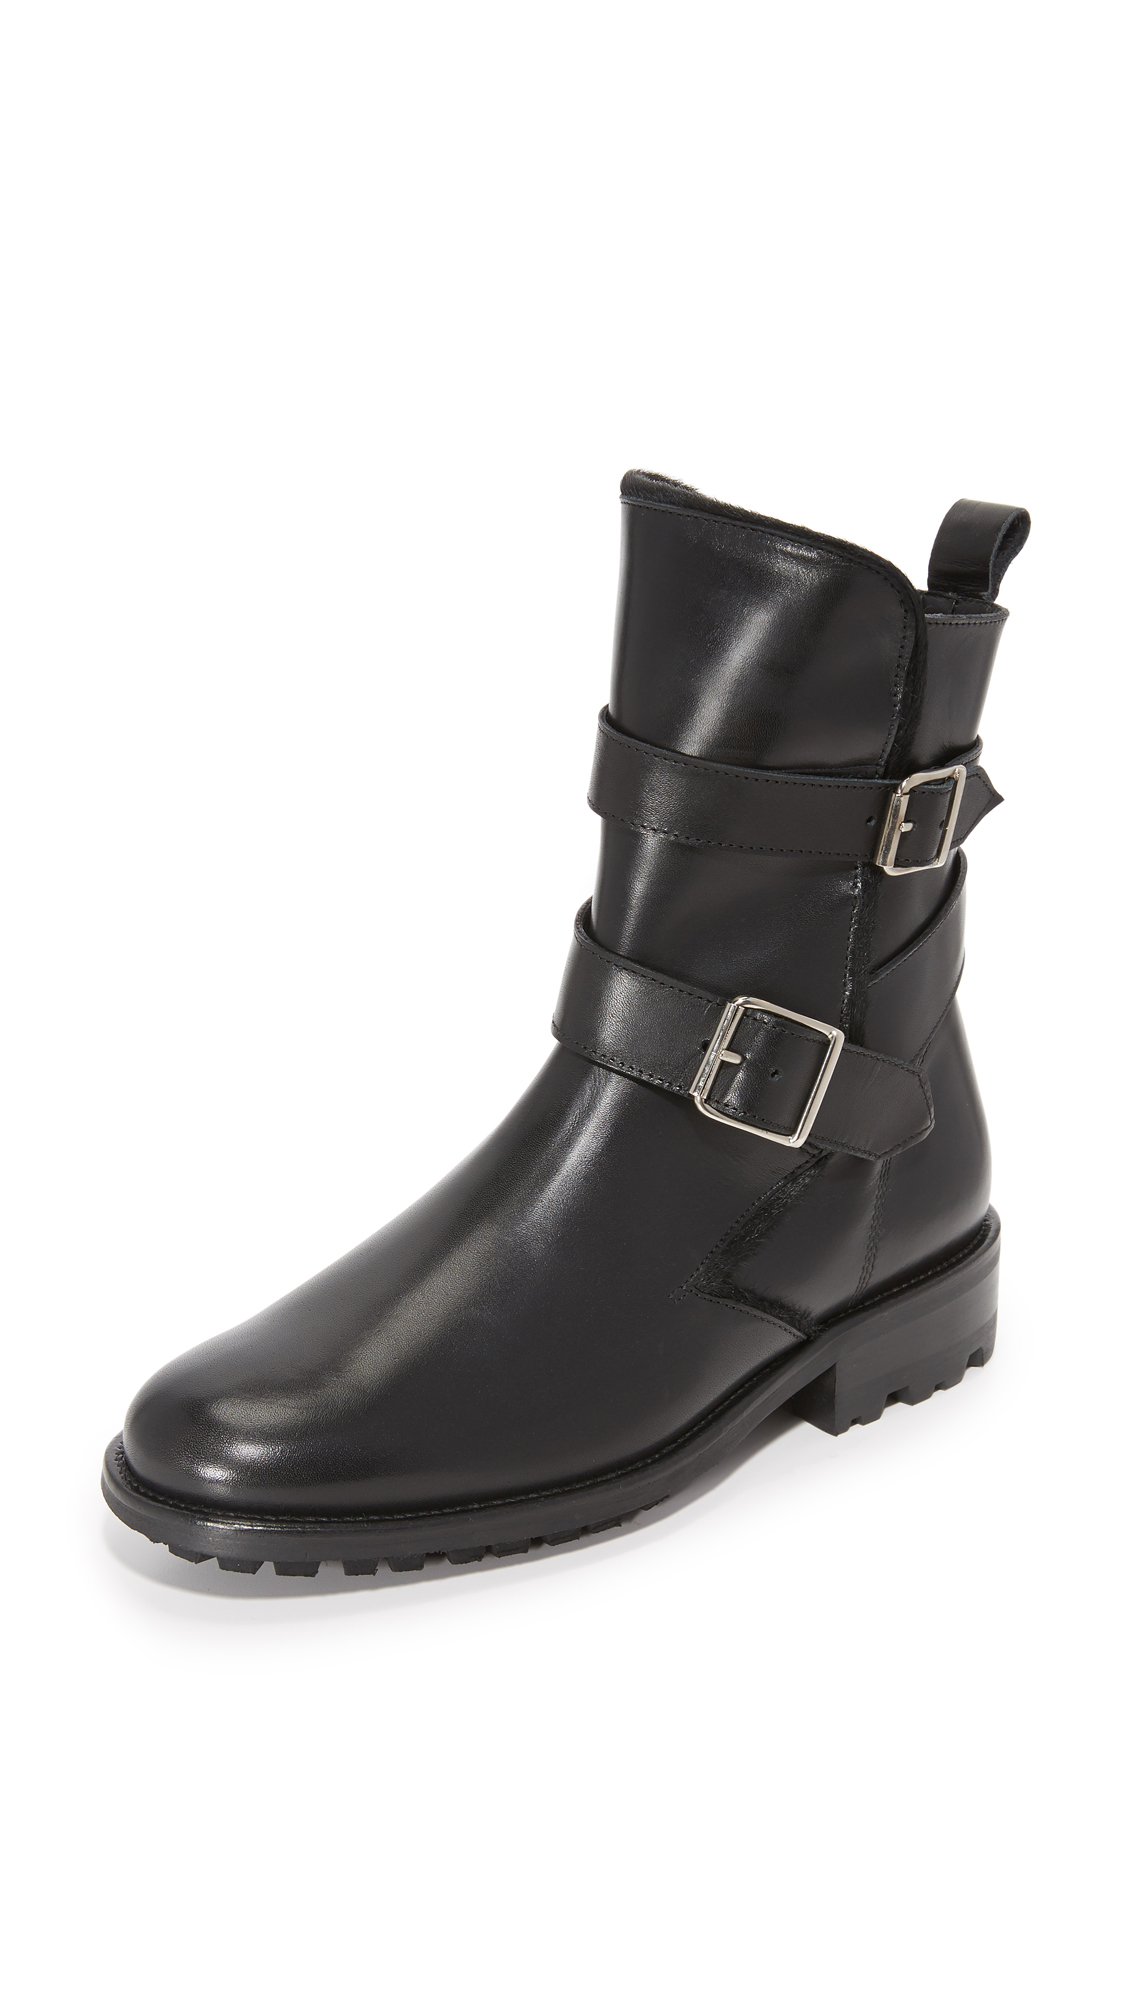 Iro Voltaz Boots - Black